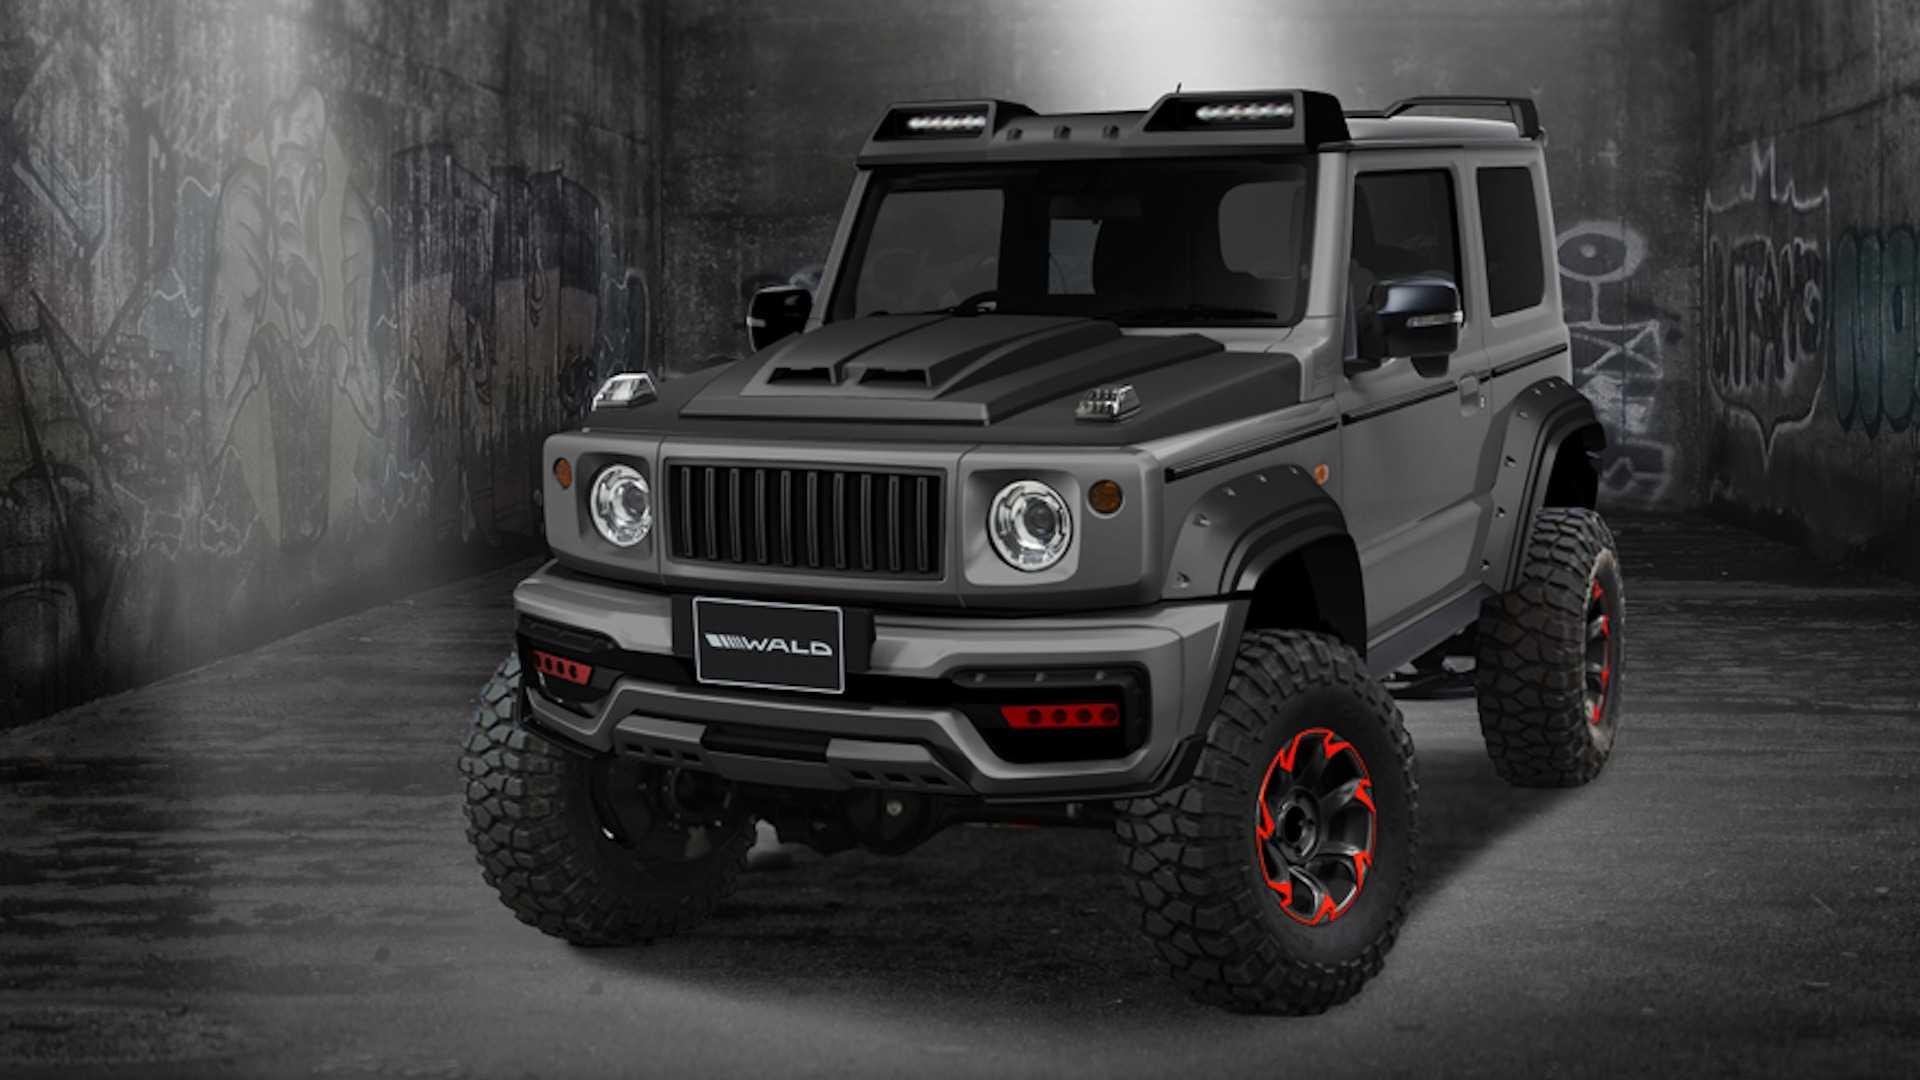 Suzuki Jimny Black Bison Wald